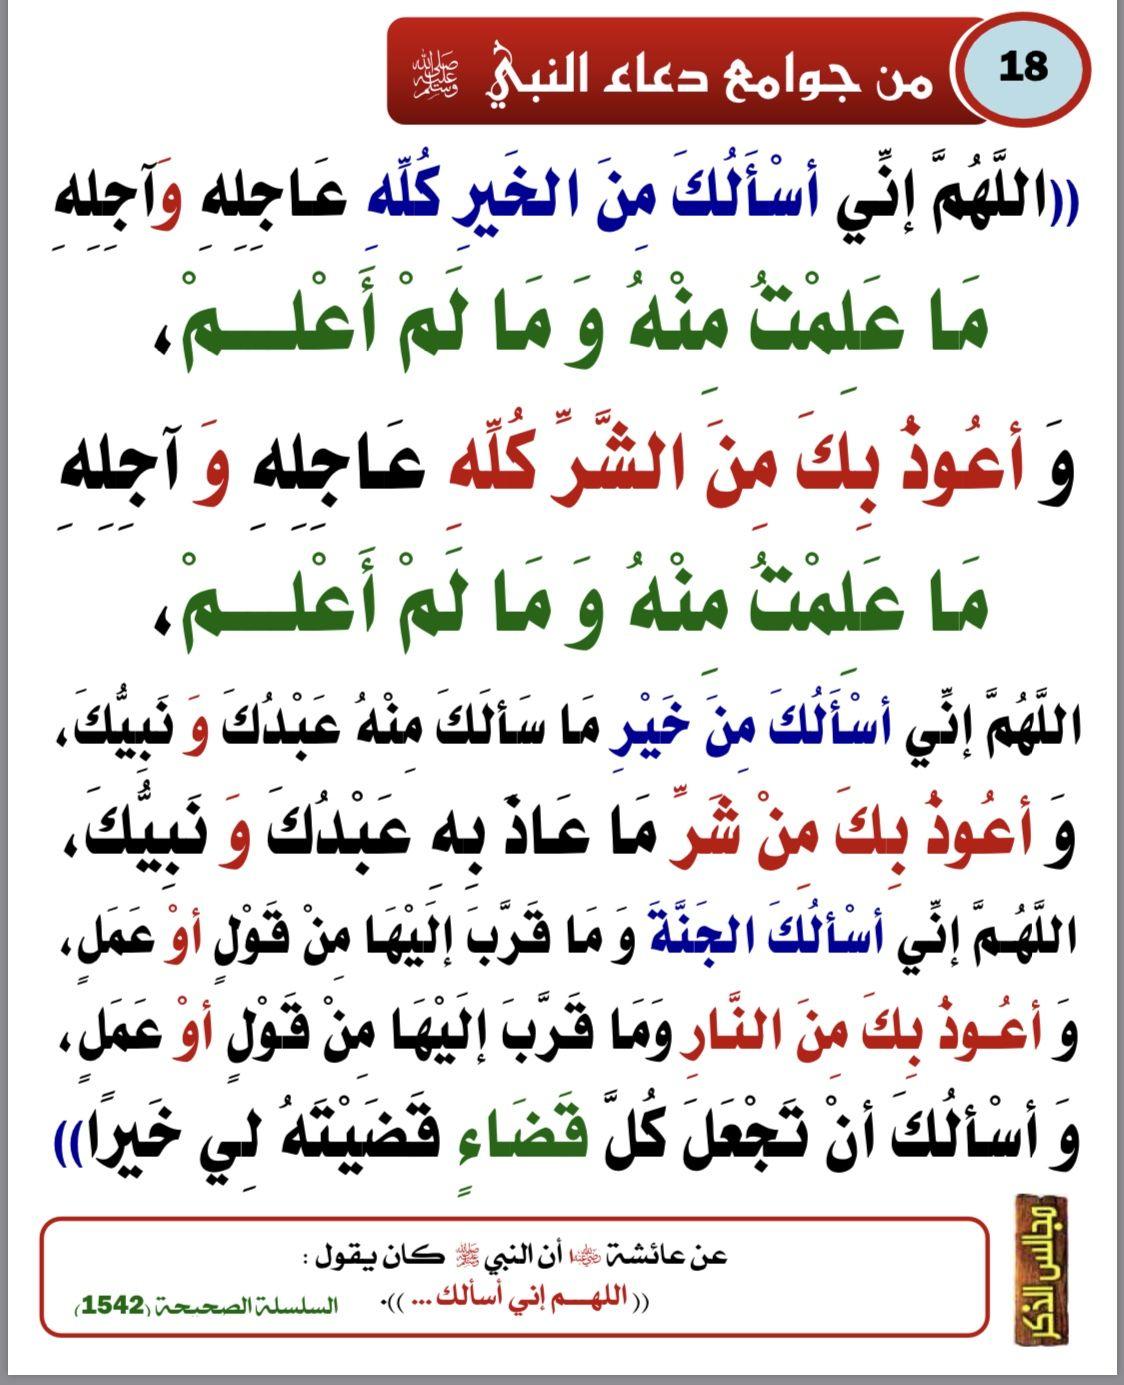 Pin By Fawaz Al Dhari On دعاء Islamic Phrases Quran Quotes Islam Facts